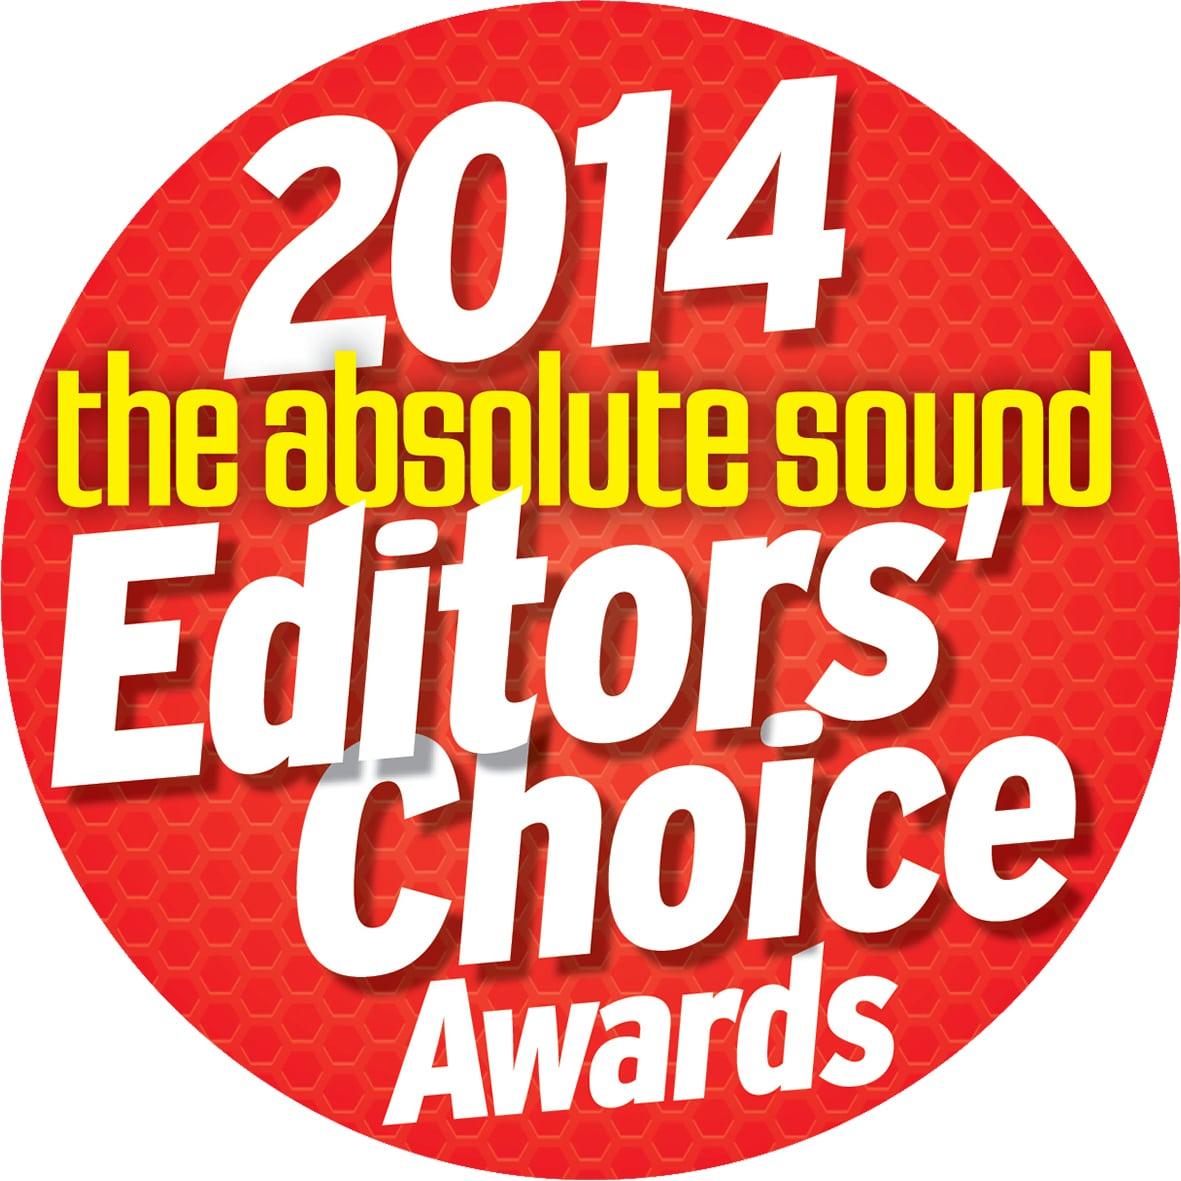 Editors choice award 2014 for S-15